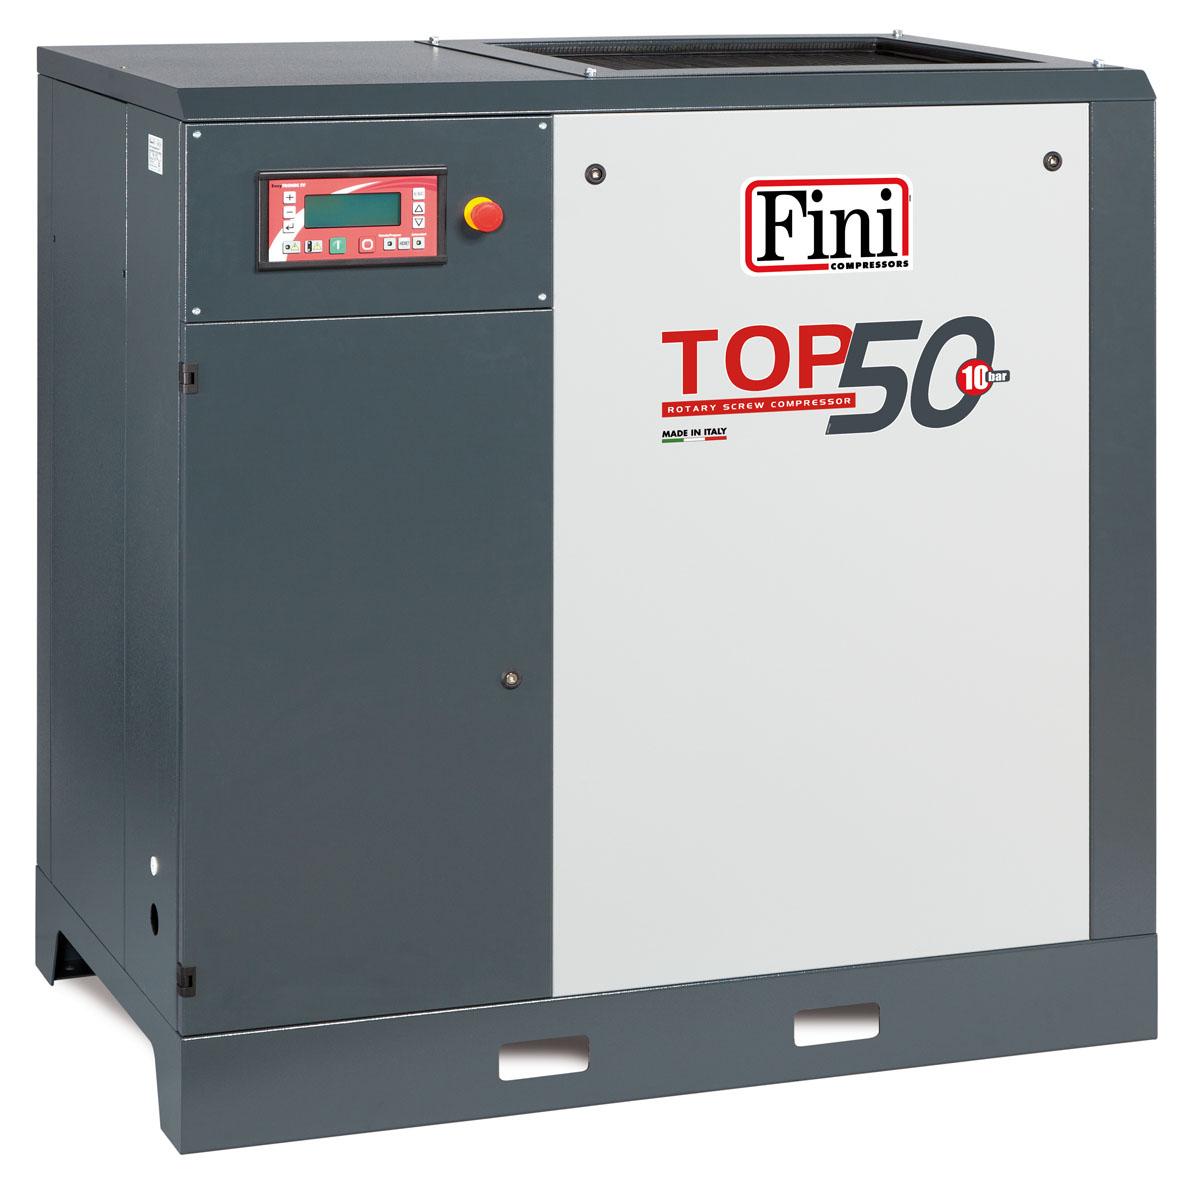 компрессор fini mc 5010 схема